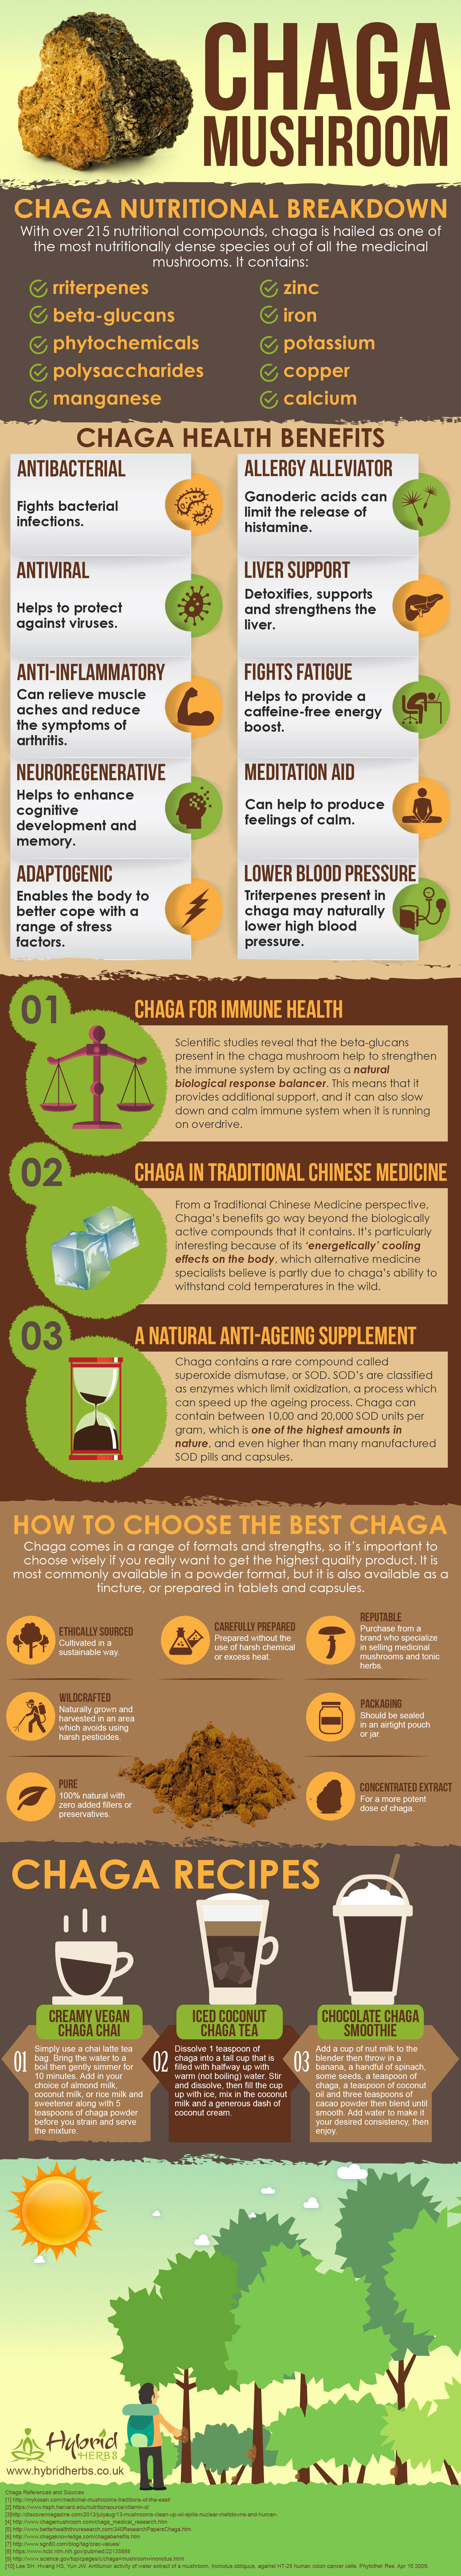 chaga-mushroom-health-benefits.jpg